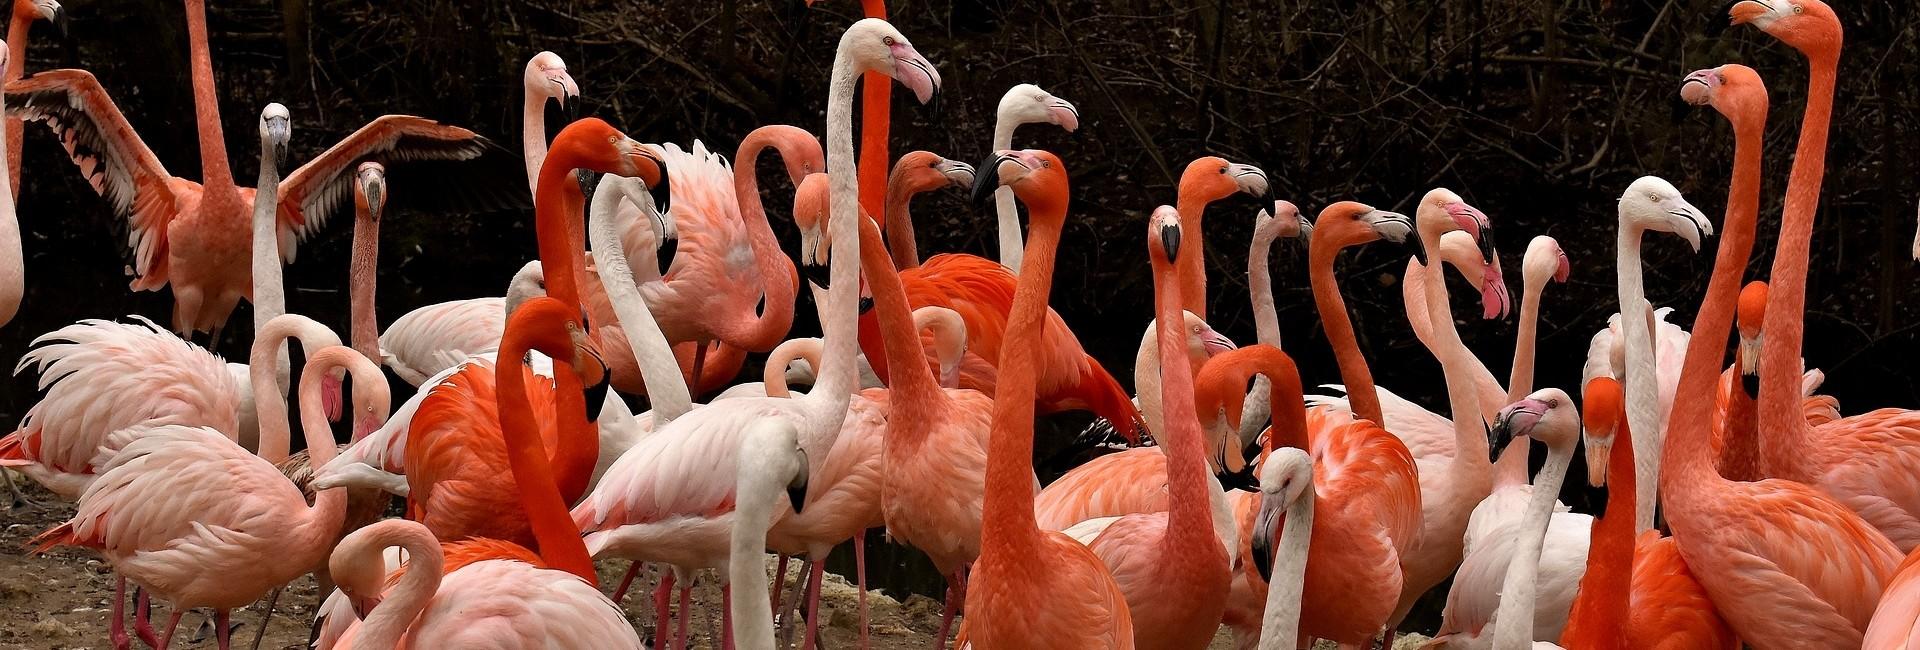 life-power-academy-flamingo